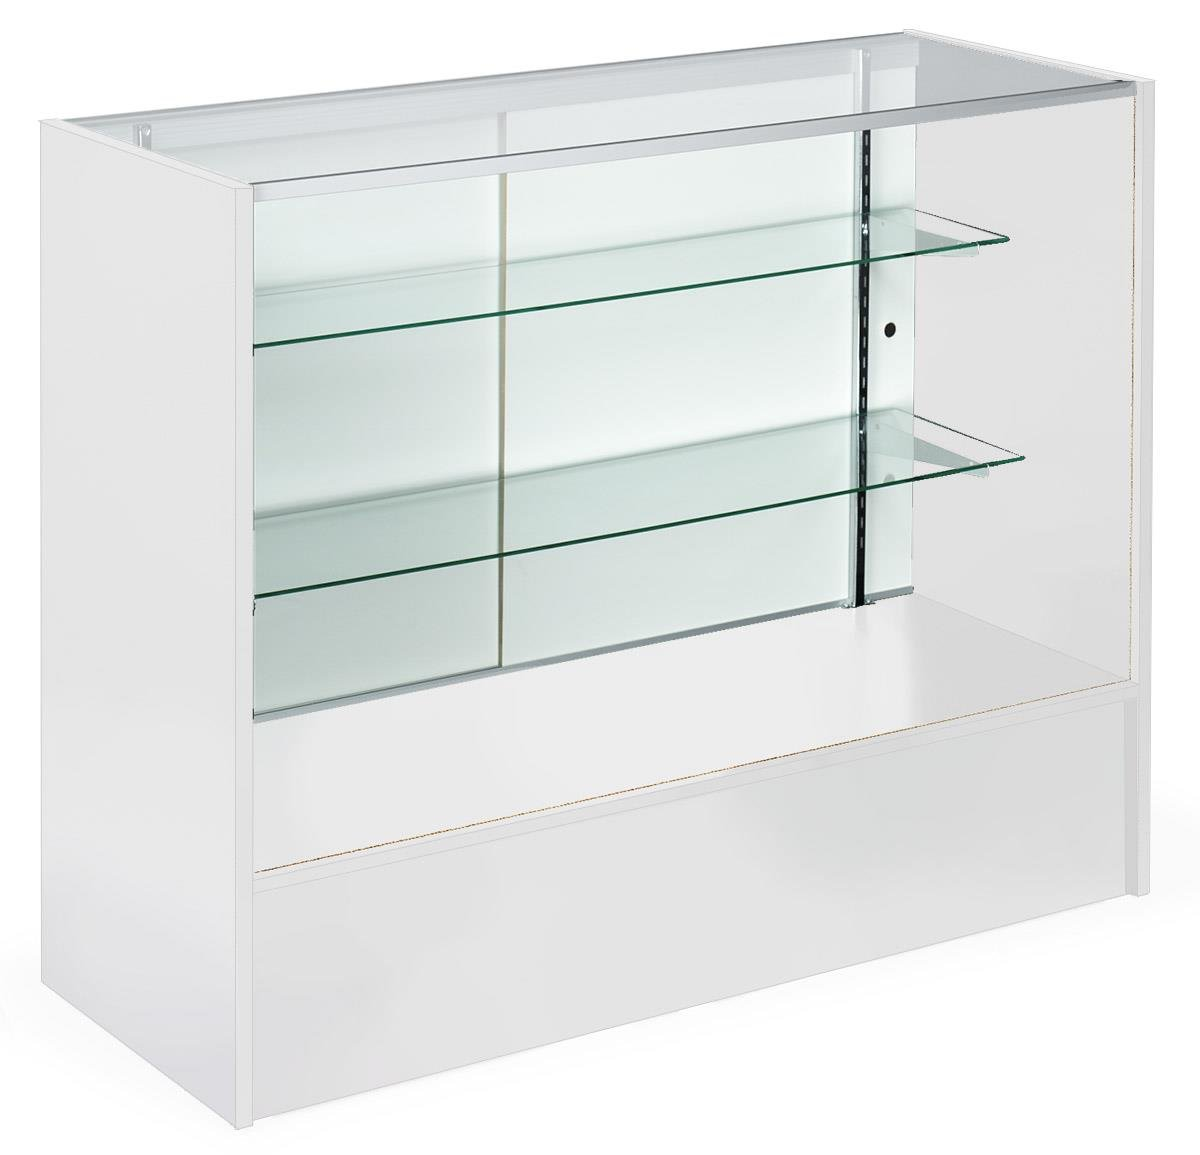 Displays2go Retail Counter with Glass Shelves, Melamine Panels, Anodized Aluminum, Sliding Doors – White, Clear (MRC4WHTKD)